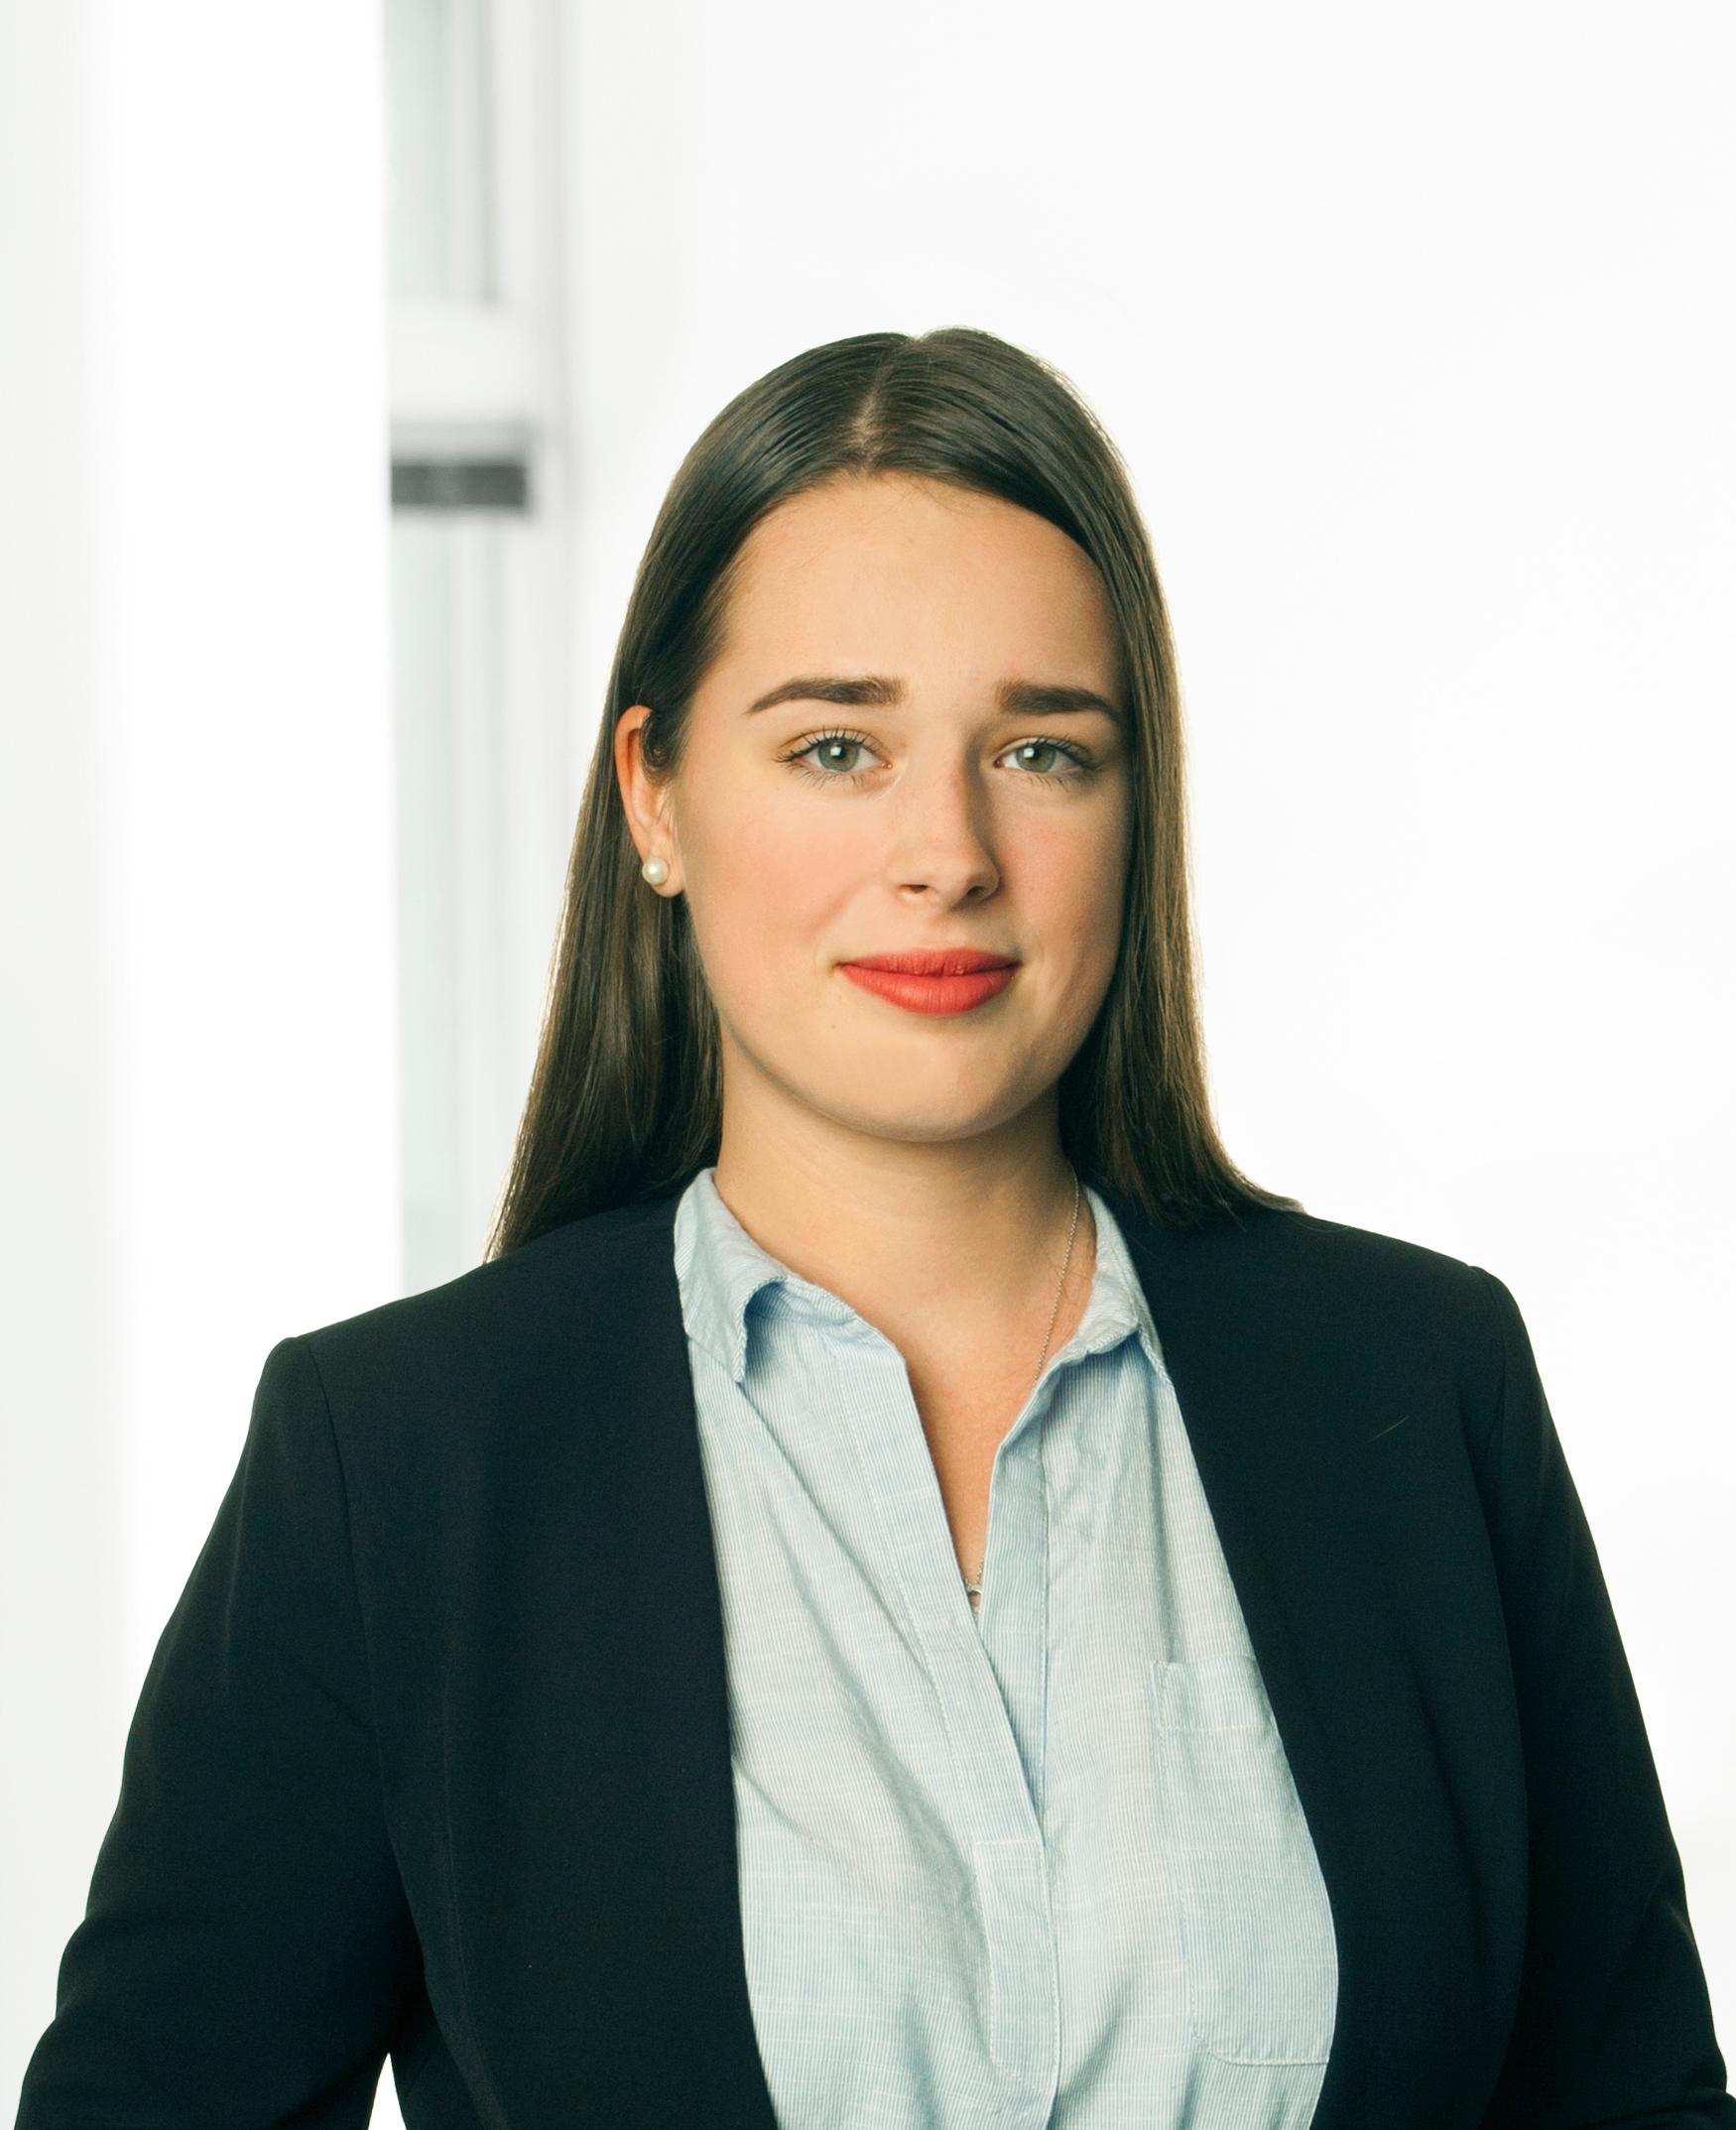 Leonie Lewerenz